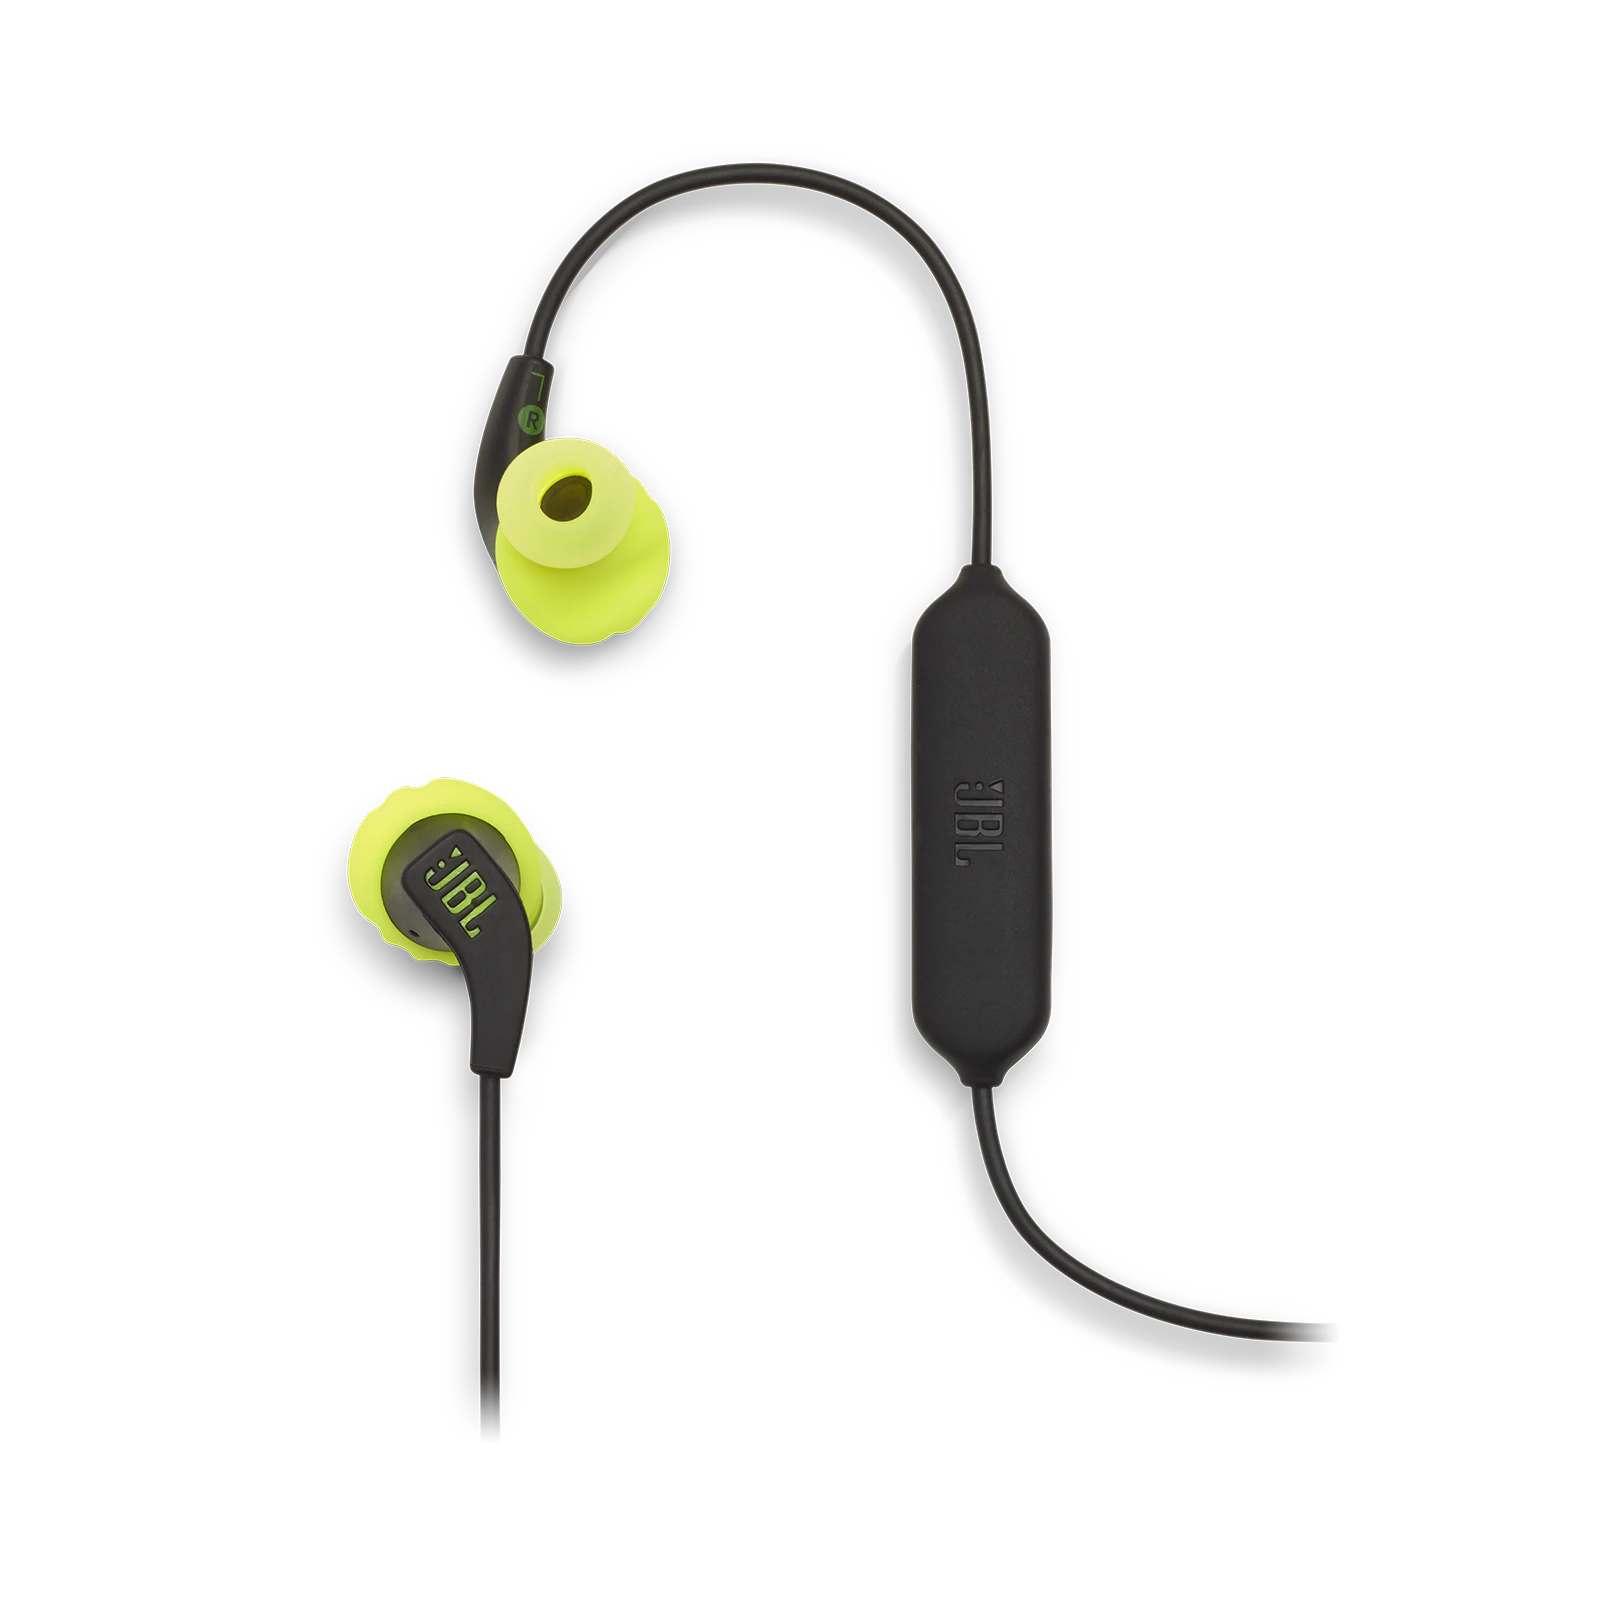 Fone de Ouvido Bluetooth JBL Endurance RUNBT - Preto e Amarelo JBLENDURRUNBTBNL